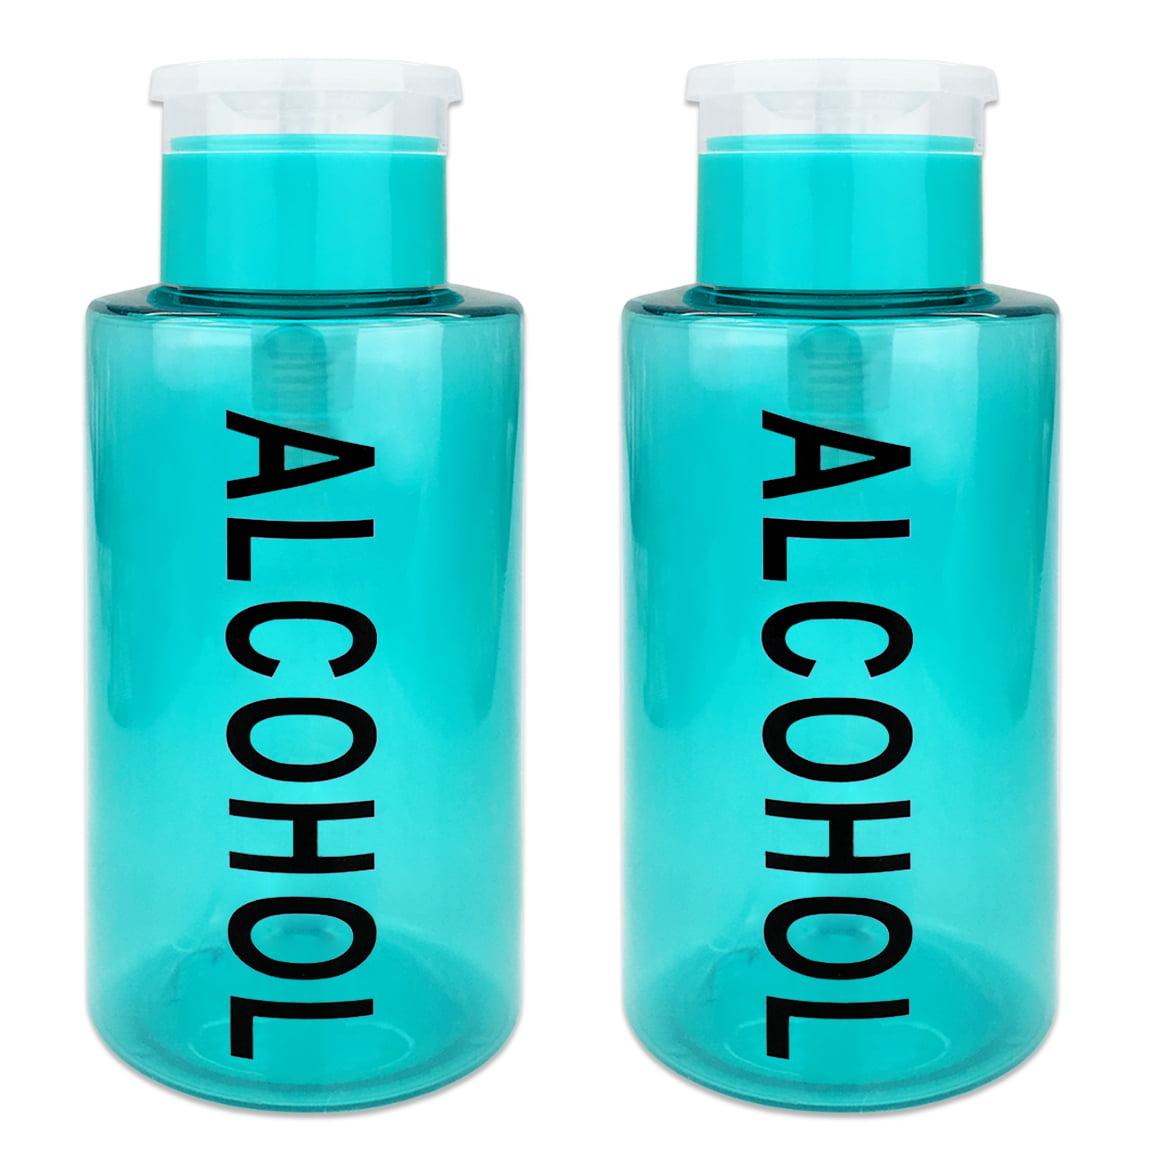 Pana High Quality 10oz Liquid Pump Dispenser With Alcohol Label - Teal (2 Bottles)